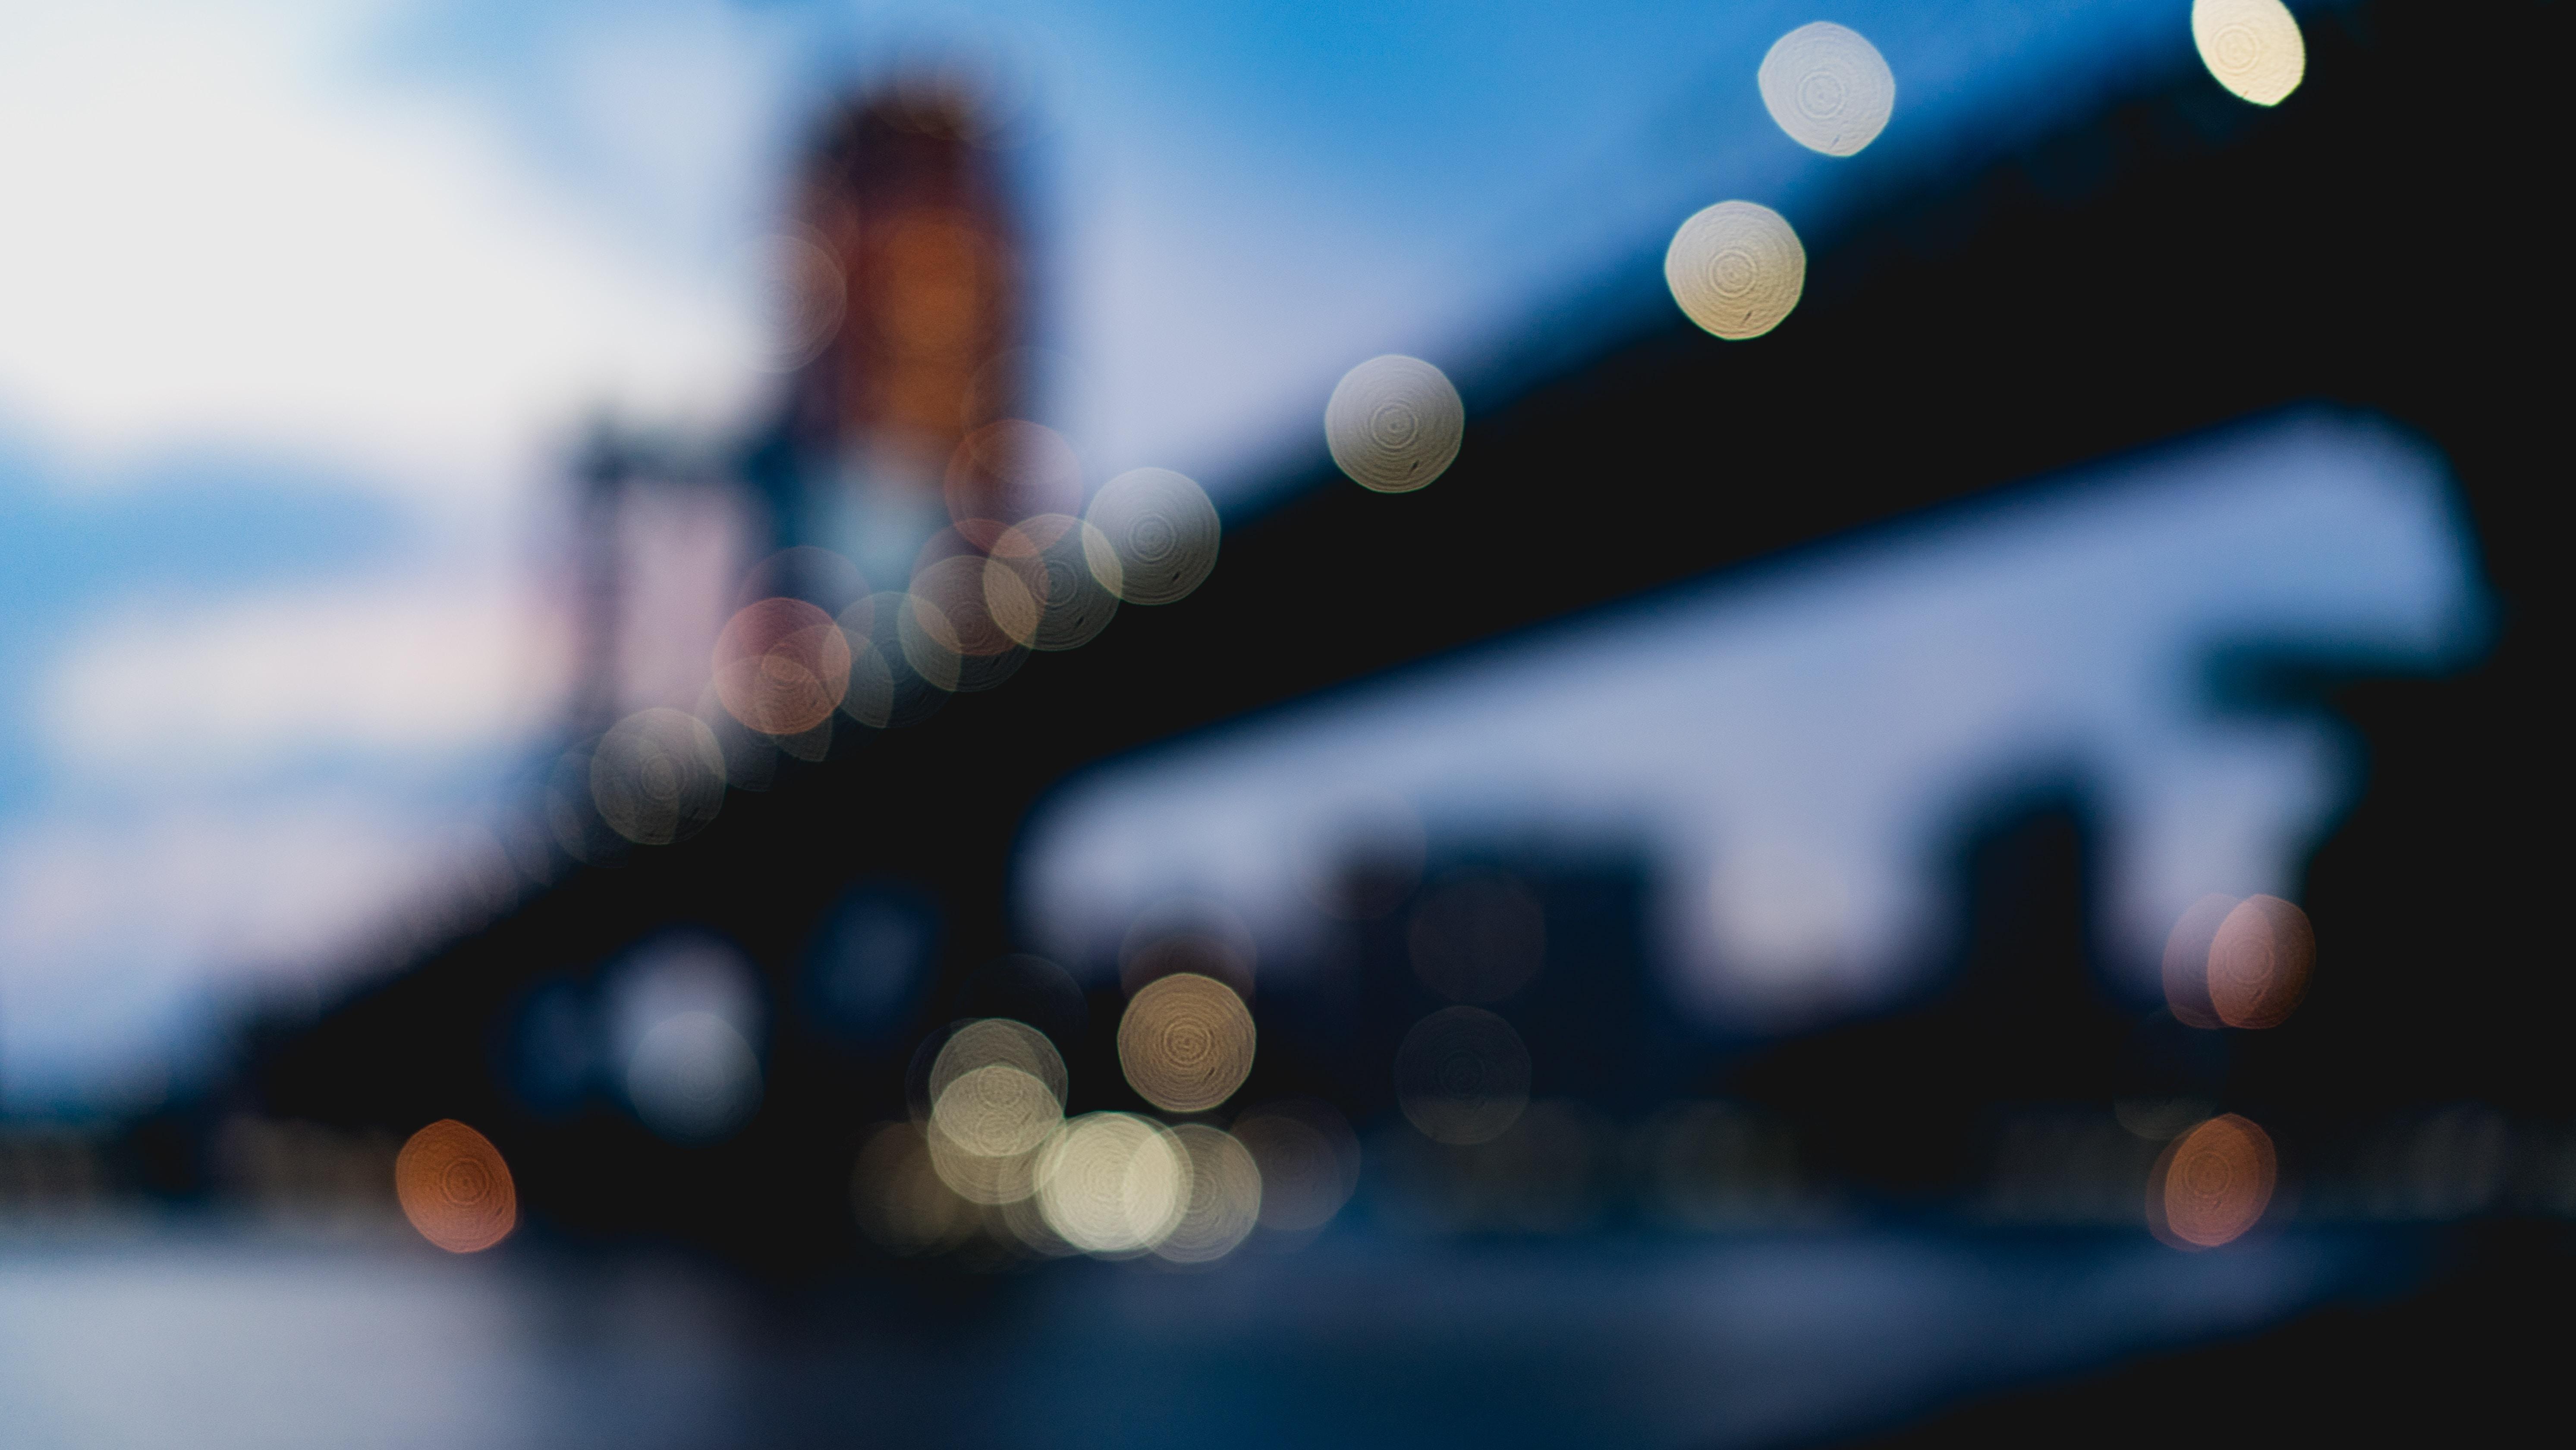 bokeh photography of suspension bridge